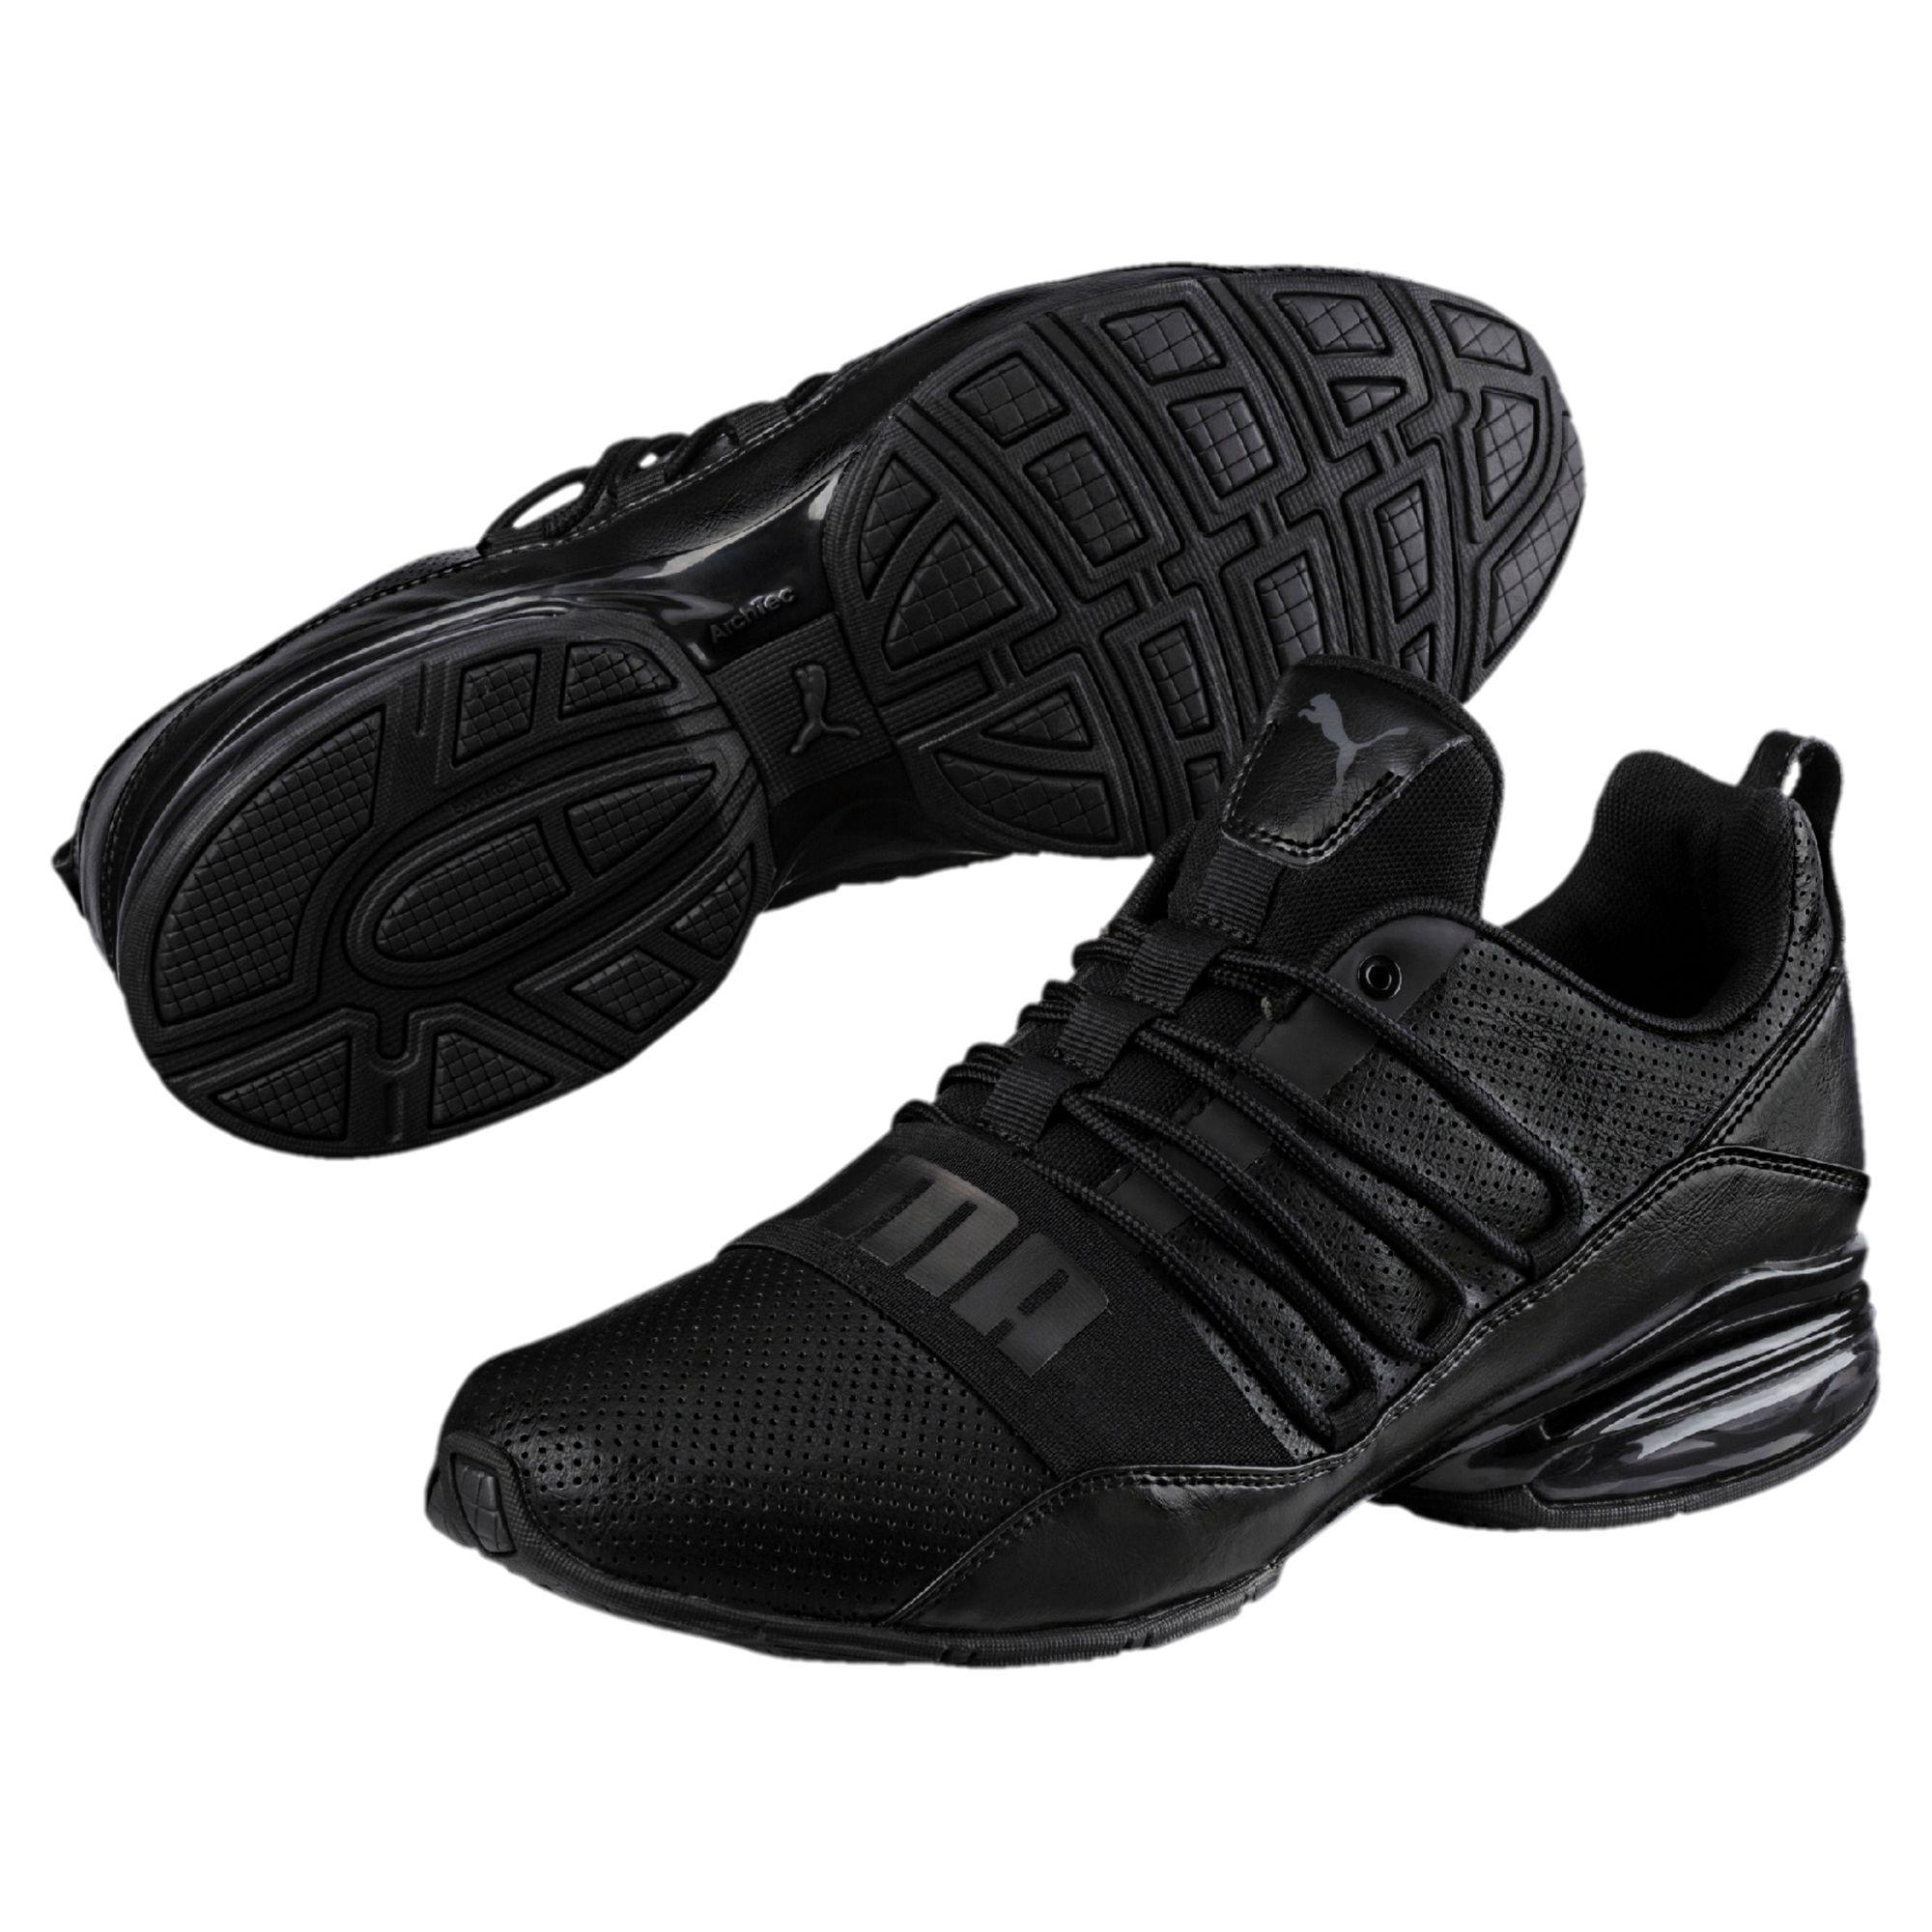 Running puma shoes black photo